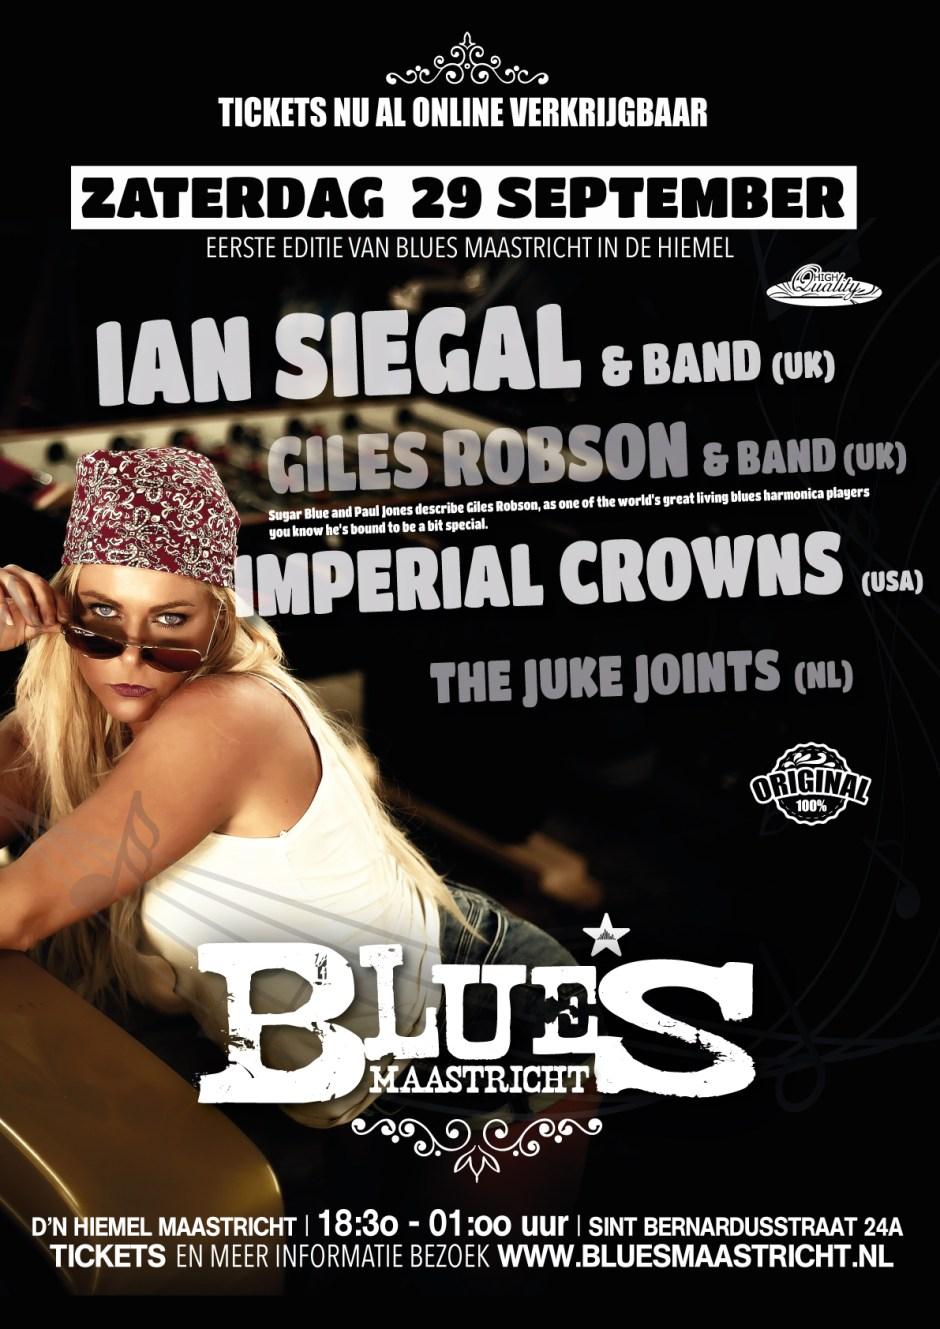 poster-internet-blues-maastricht